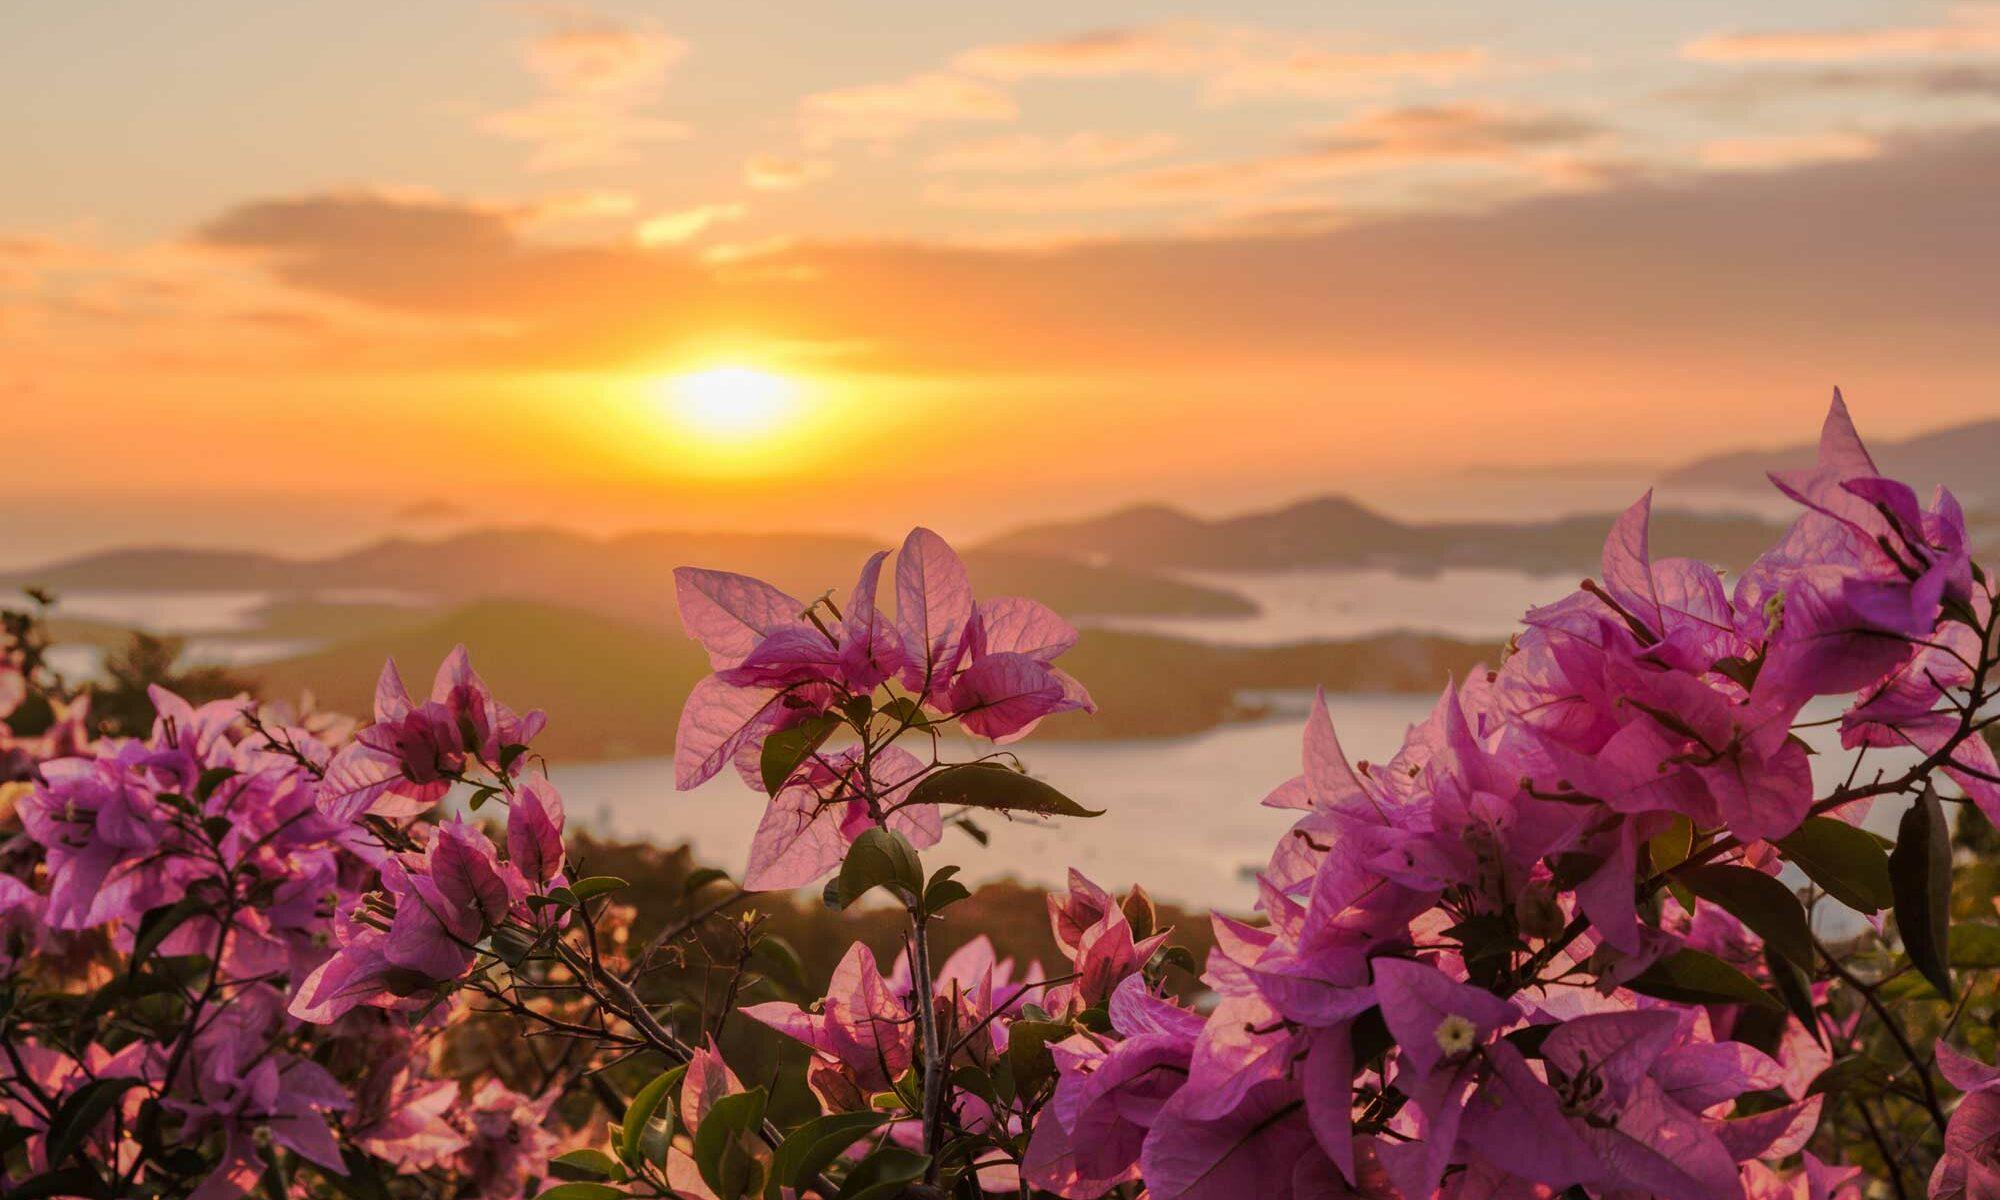 Flowers at Sunset on the USVI